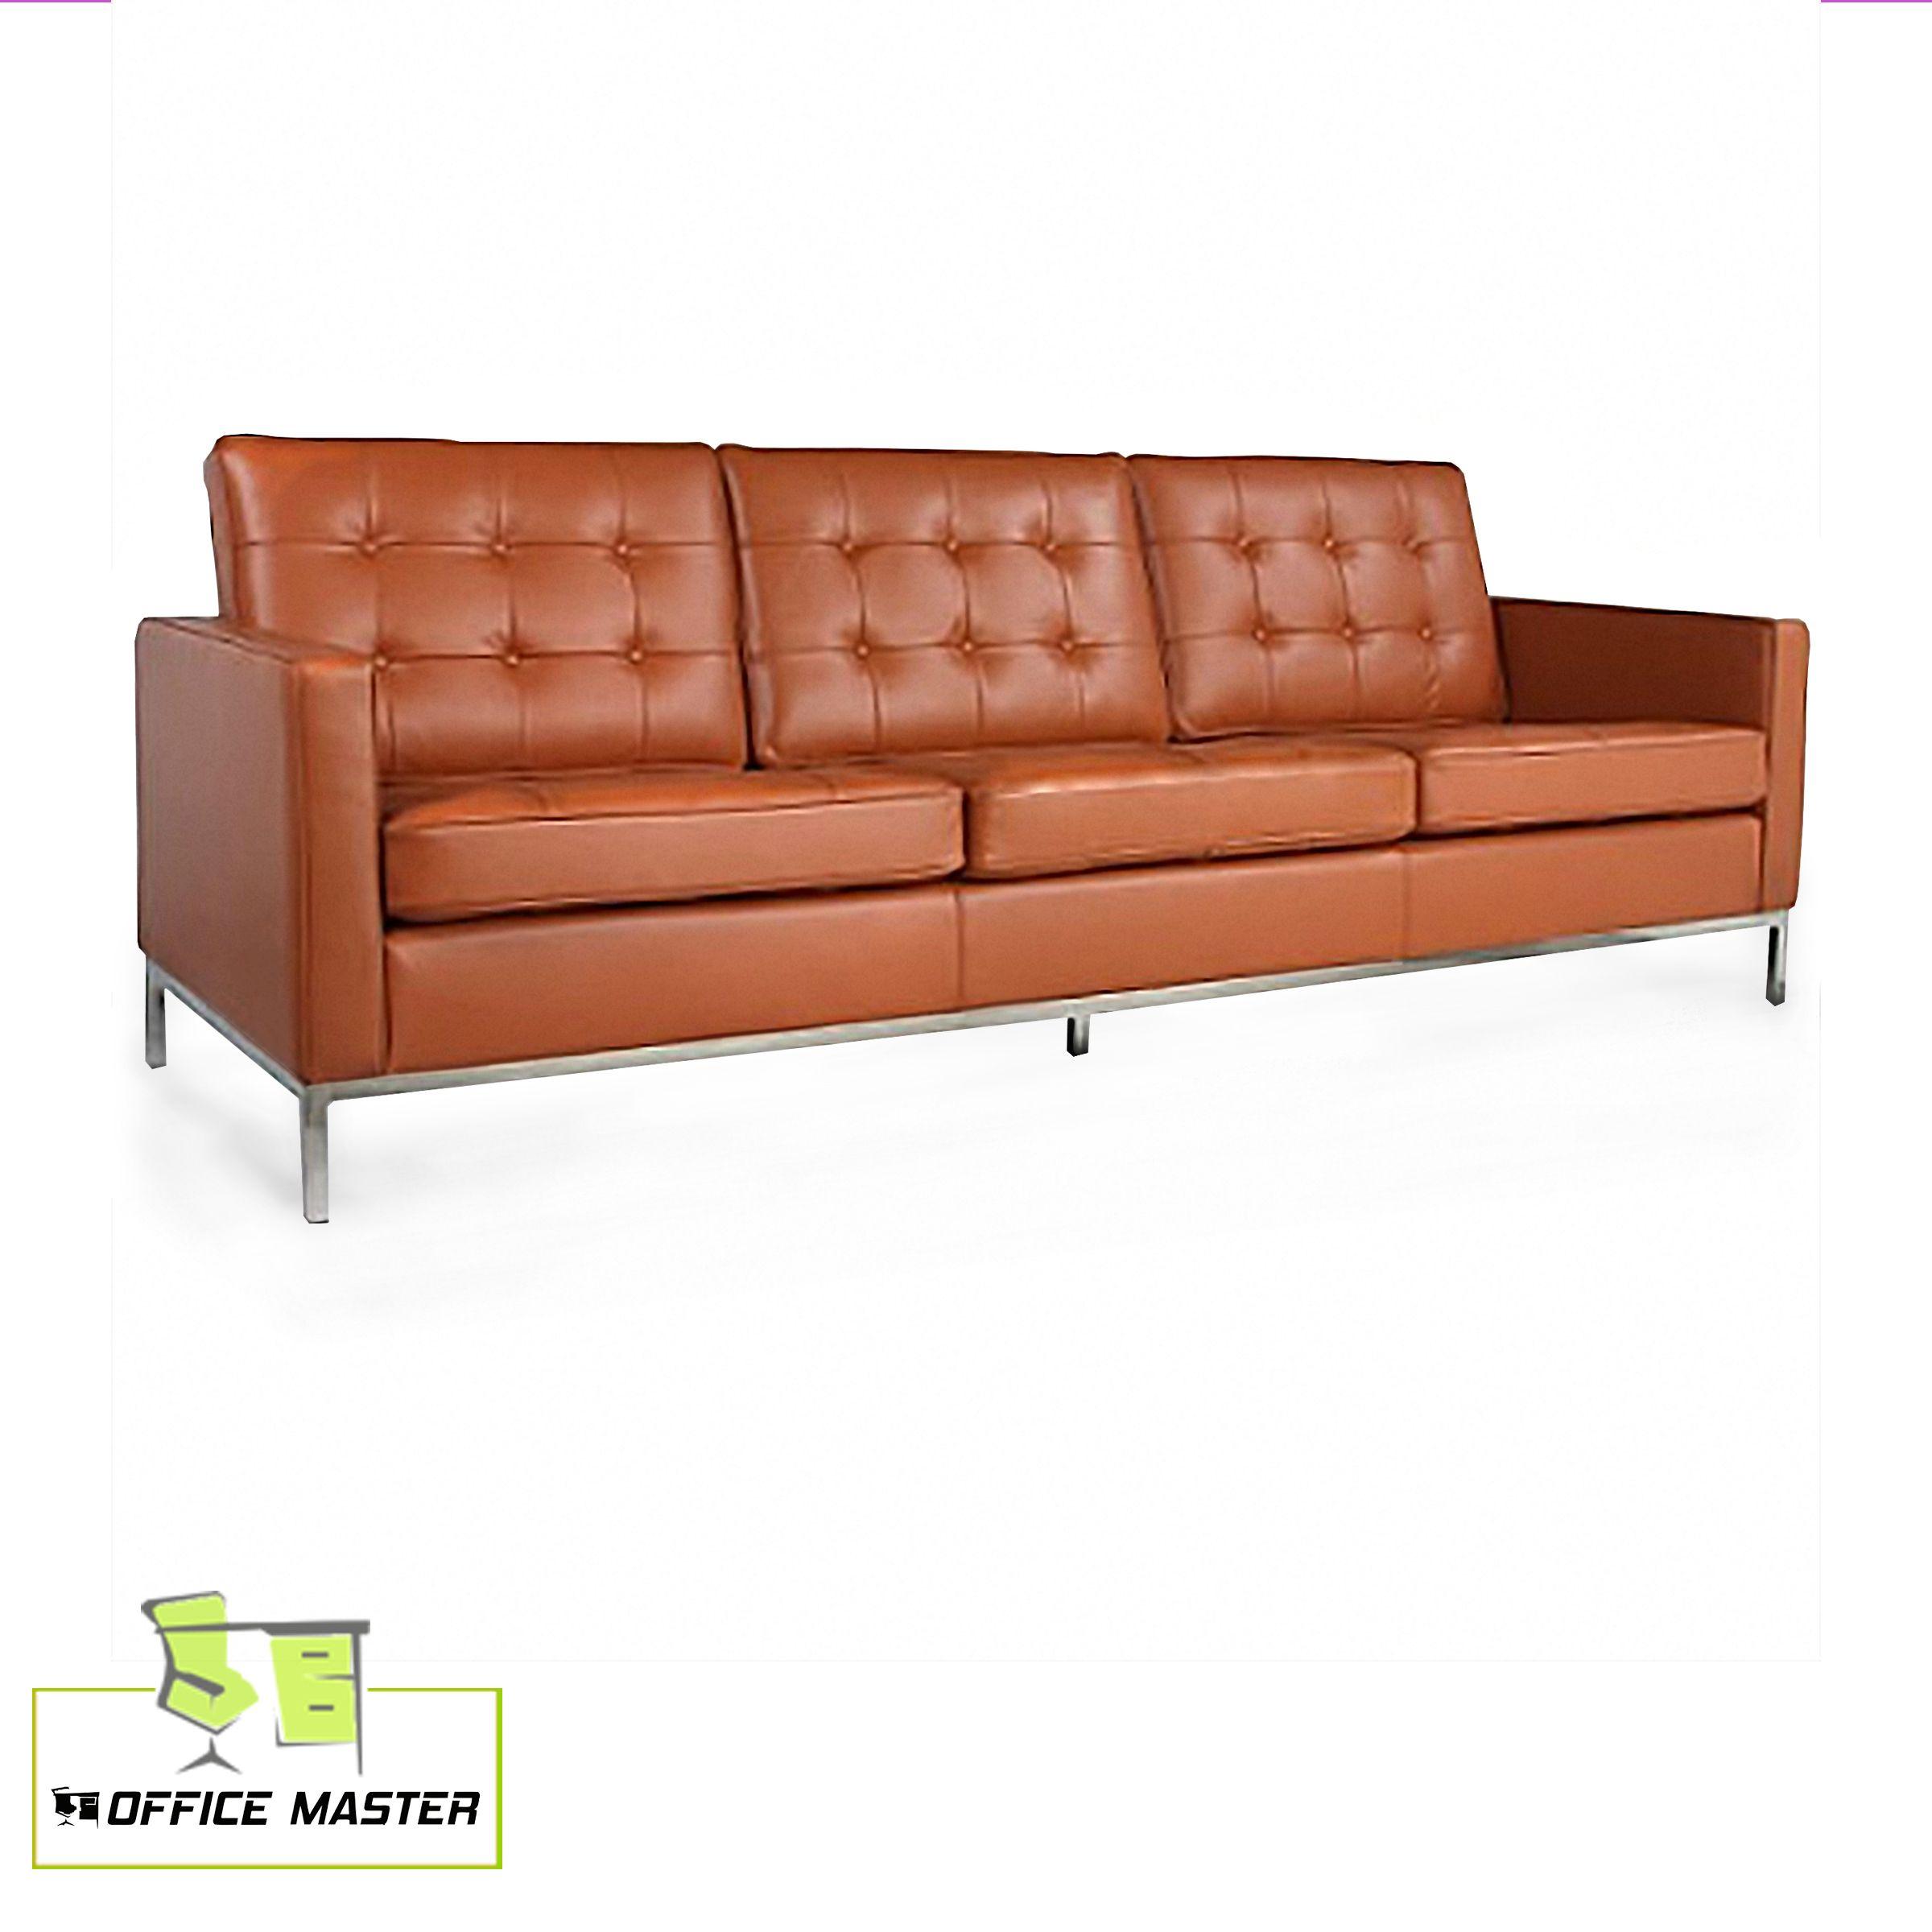 Alexa Three Seater Sofa 1 750 00 Custom Made Elegant Chesterfield Backrest Design Lounge Sofa With Eco Leather Material I Three Seater Sofa Seater Sofa Sofa